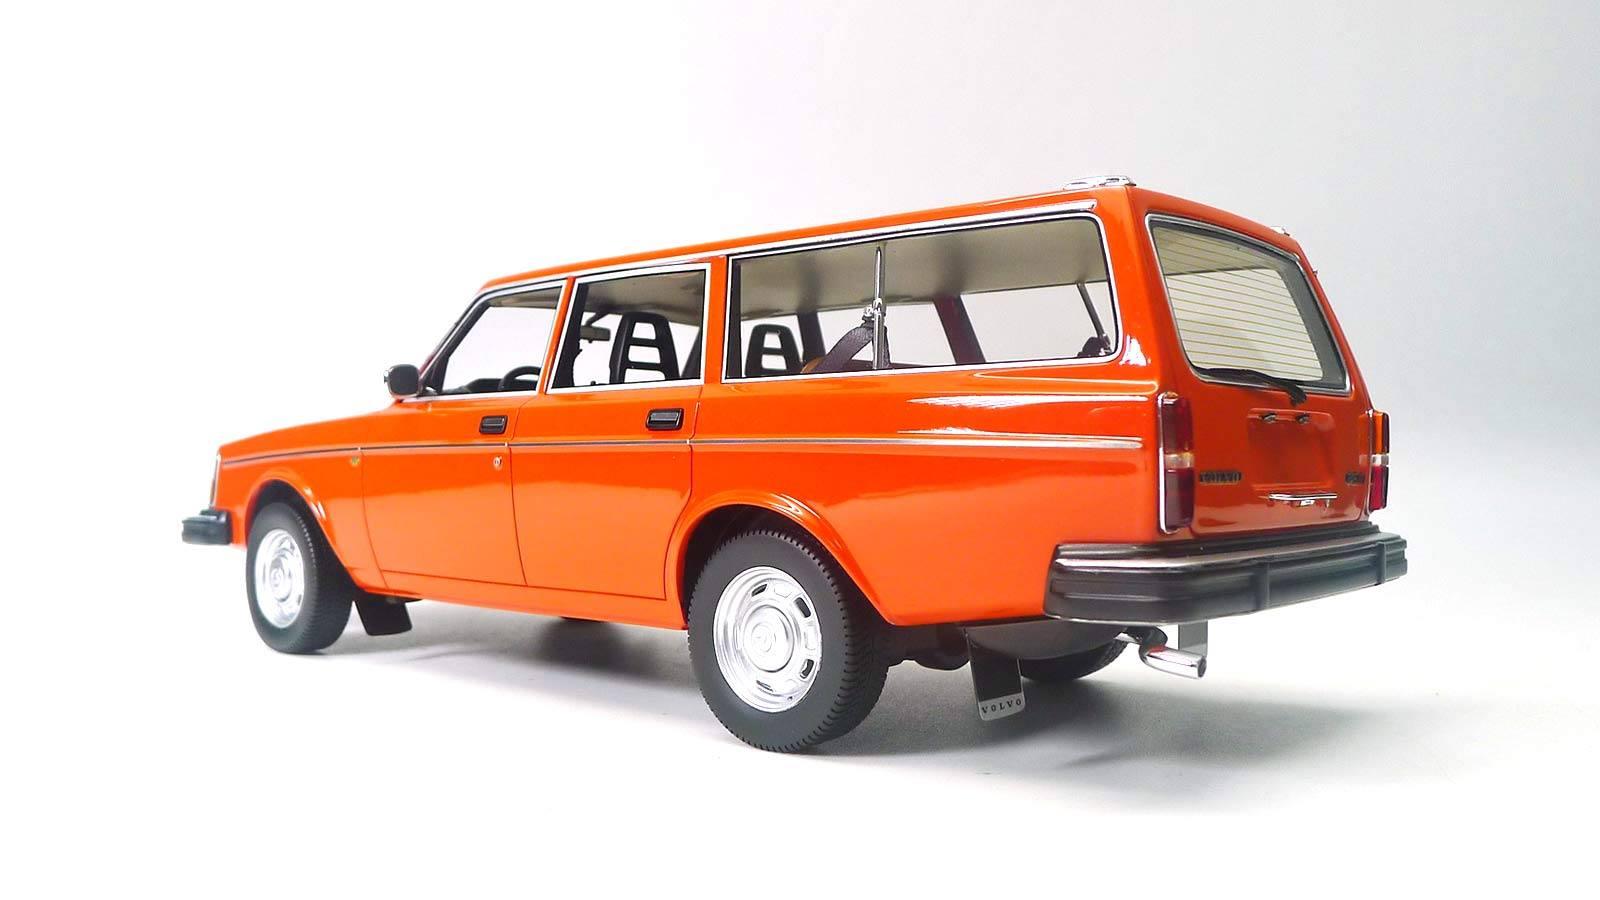 DNA000080 Volvo 245 DL Orange